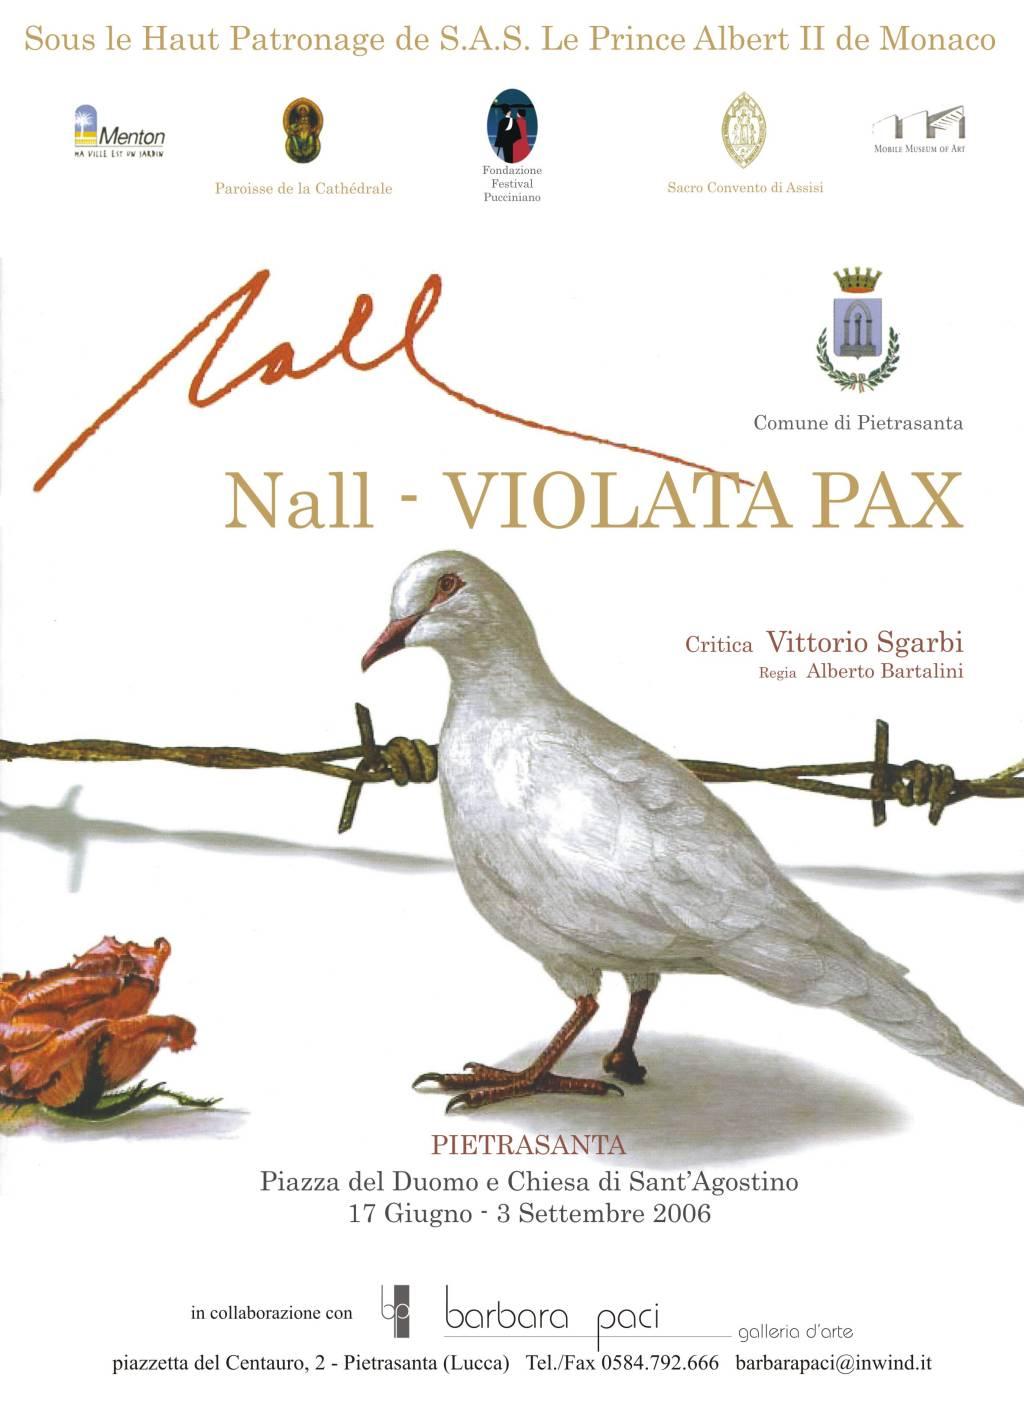 Nall - Violata Pax - Barbara Paci Galleria d